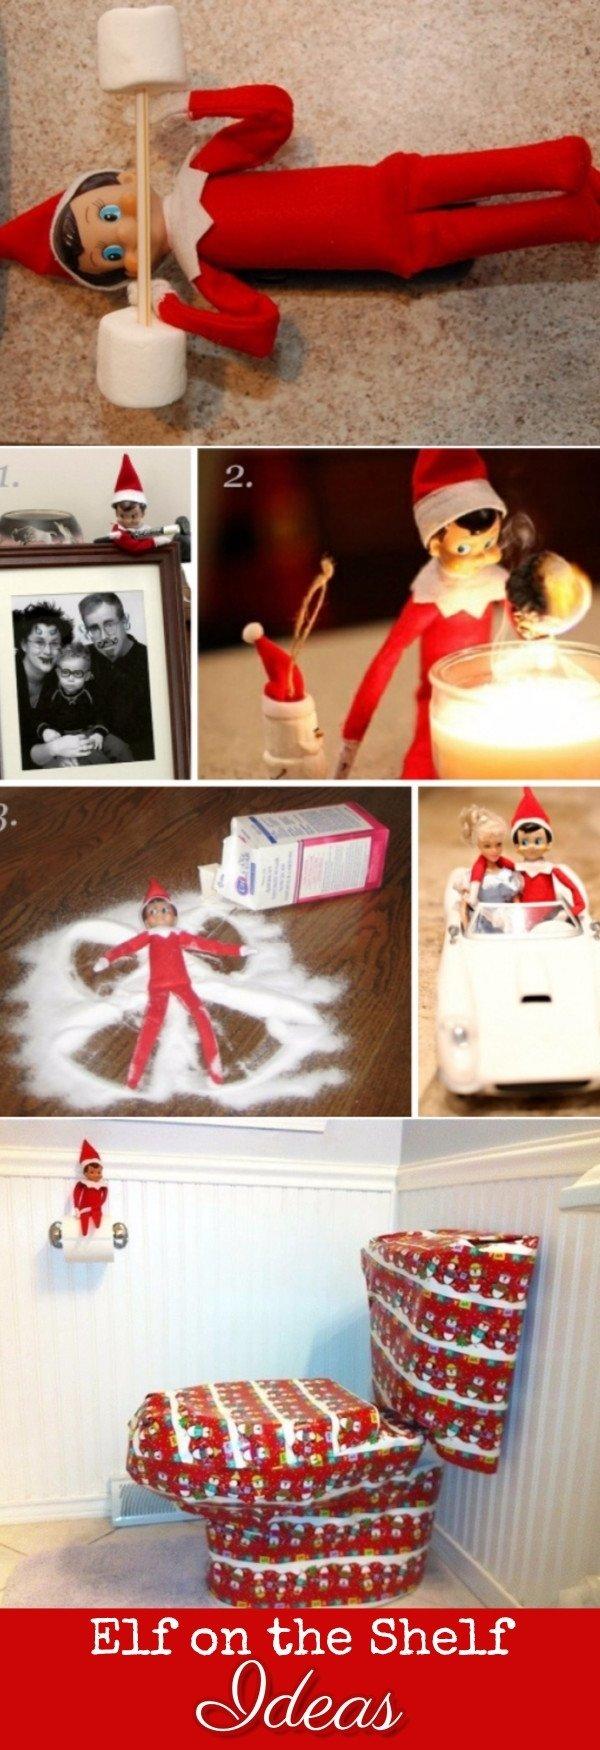 10 Most Popular Ideas For Elf On The Shelf Pranks 10 elf on the shelf ideas for christmas 2017 crazy elf such pranks 3 2020